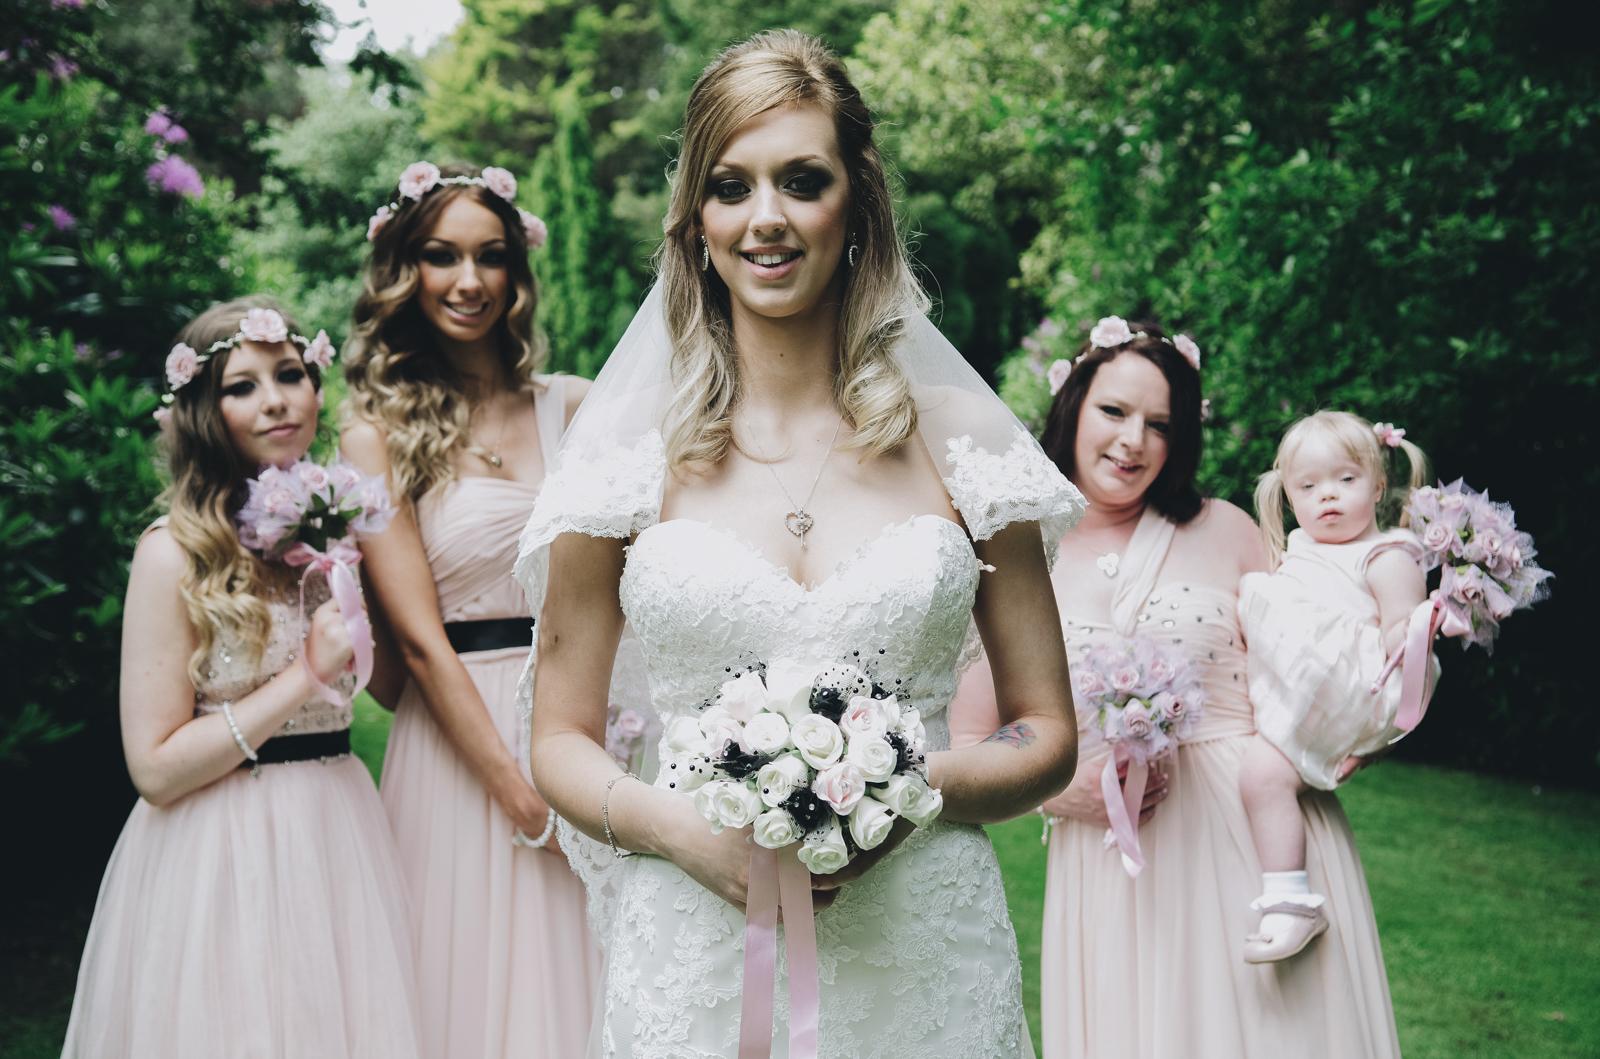 Alternative-North-West-Manchester-Wedding-Photography-Astley-bank-Wedding-skull-cake-tattooed-groom-28.jpg